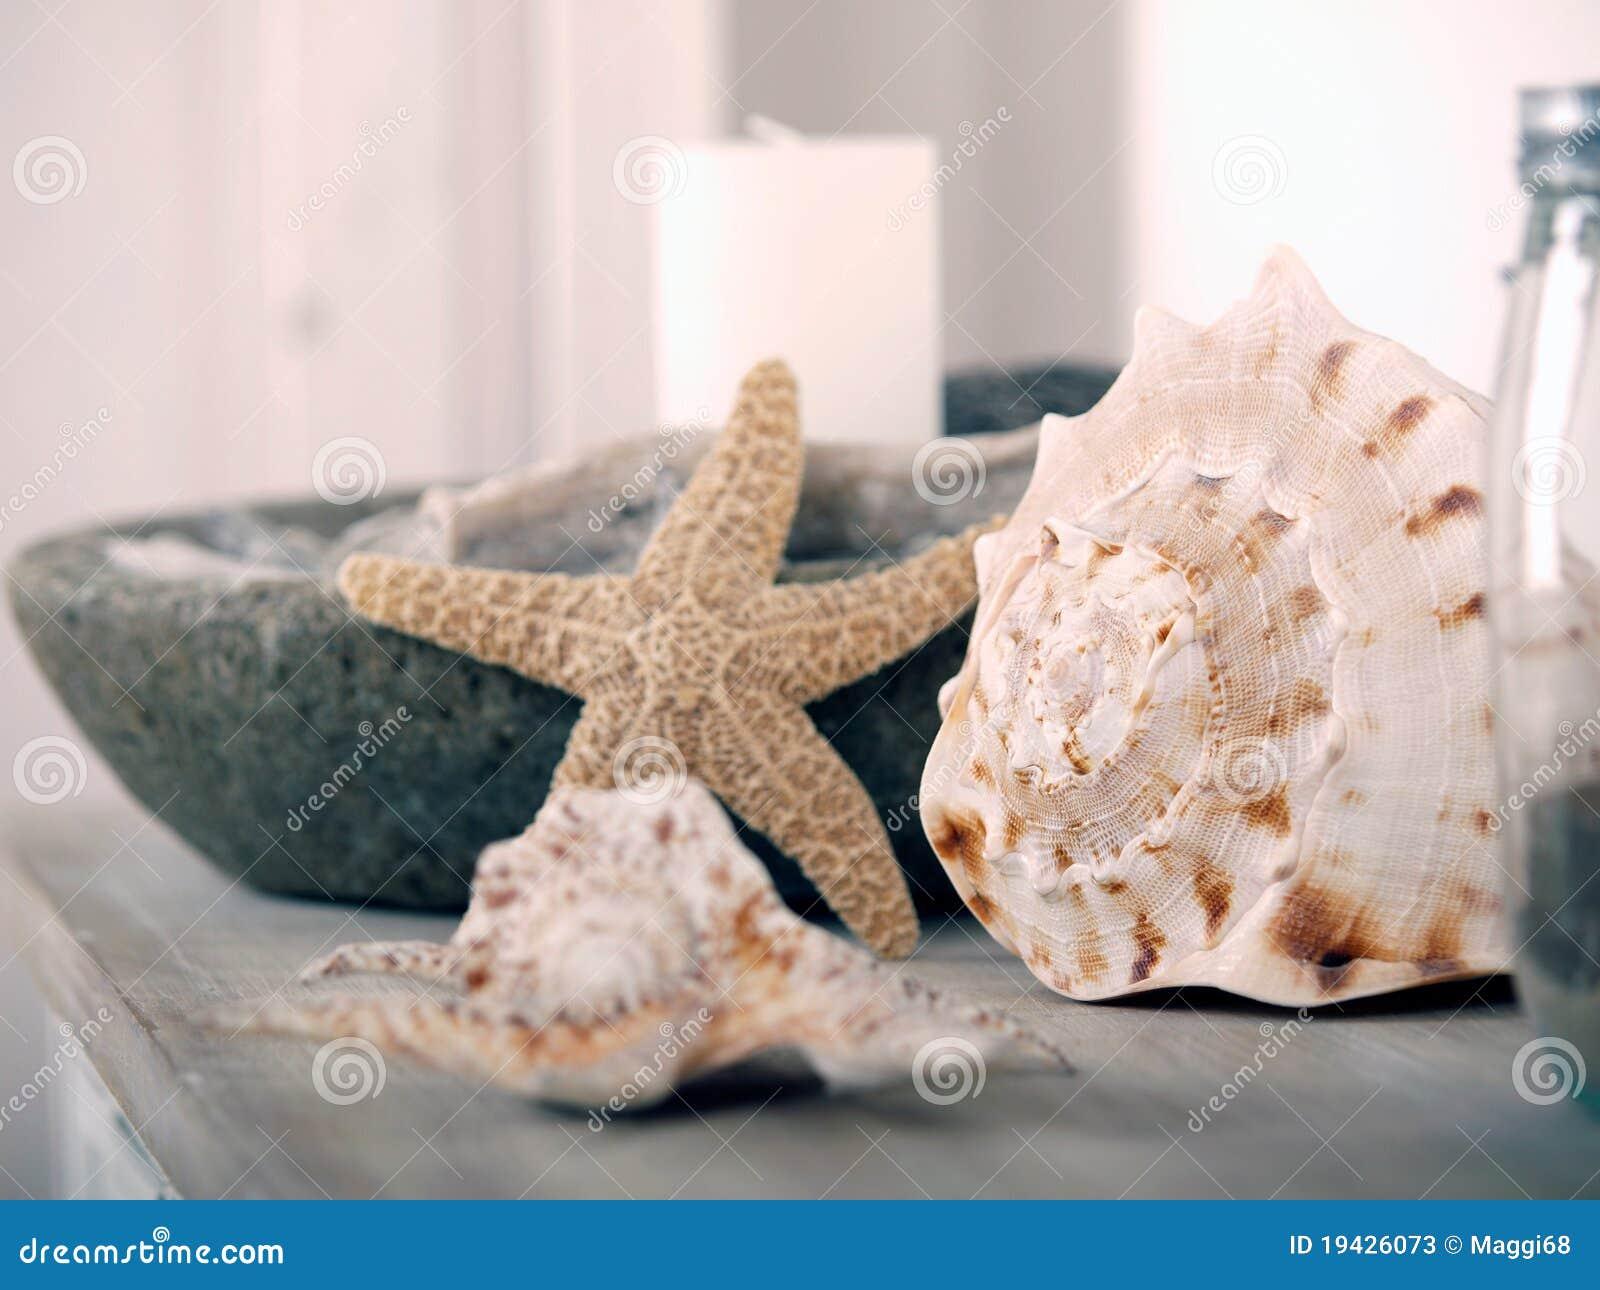 beach decoration stock photos image 19426073. Black Bedroom Furniture Sets. Home Design Ideas